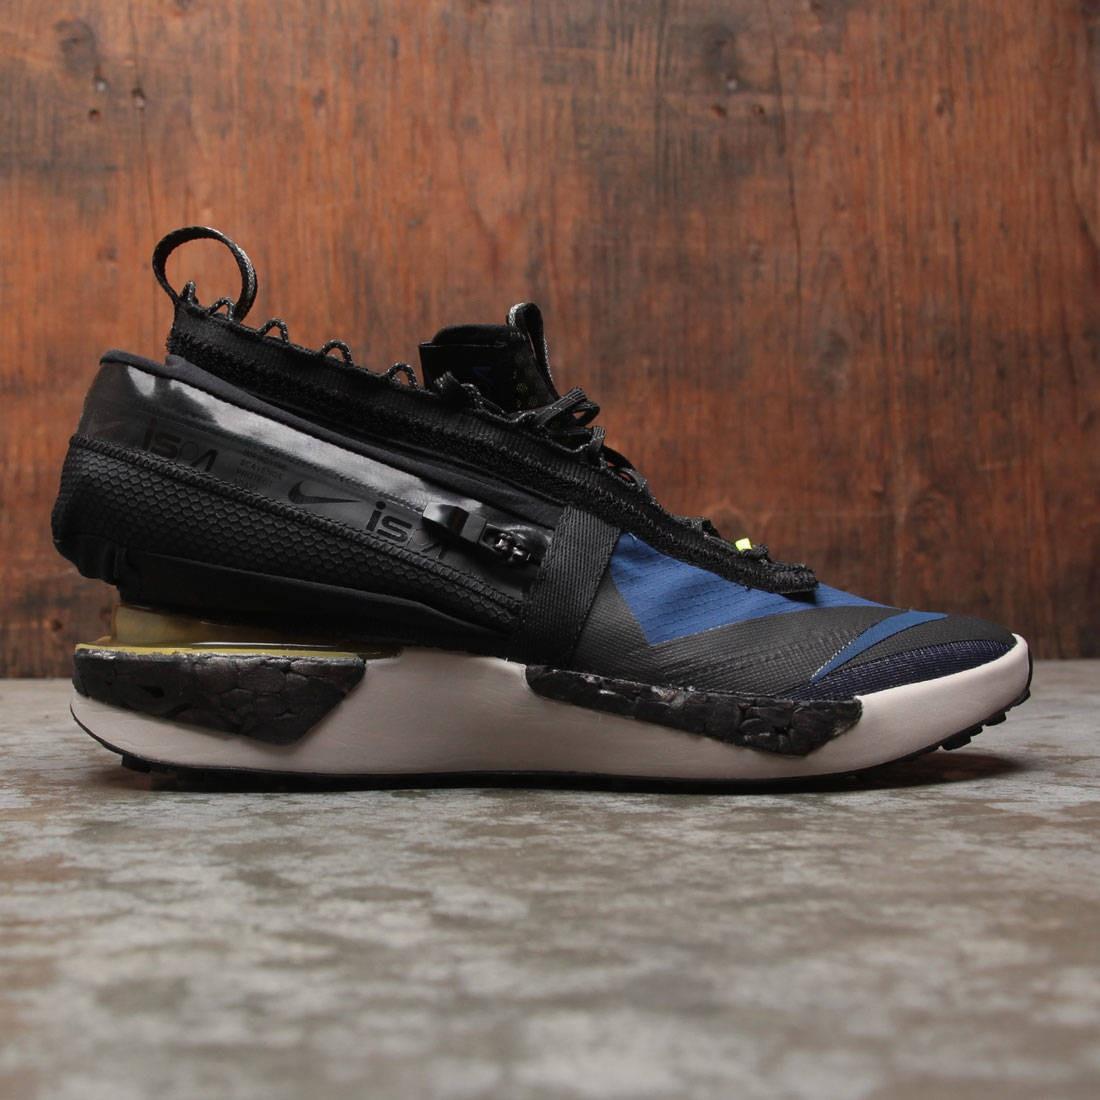 Nike Men Ispa Drifter Gator (coastal blue / coastal blue-black-volt)